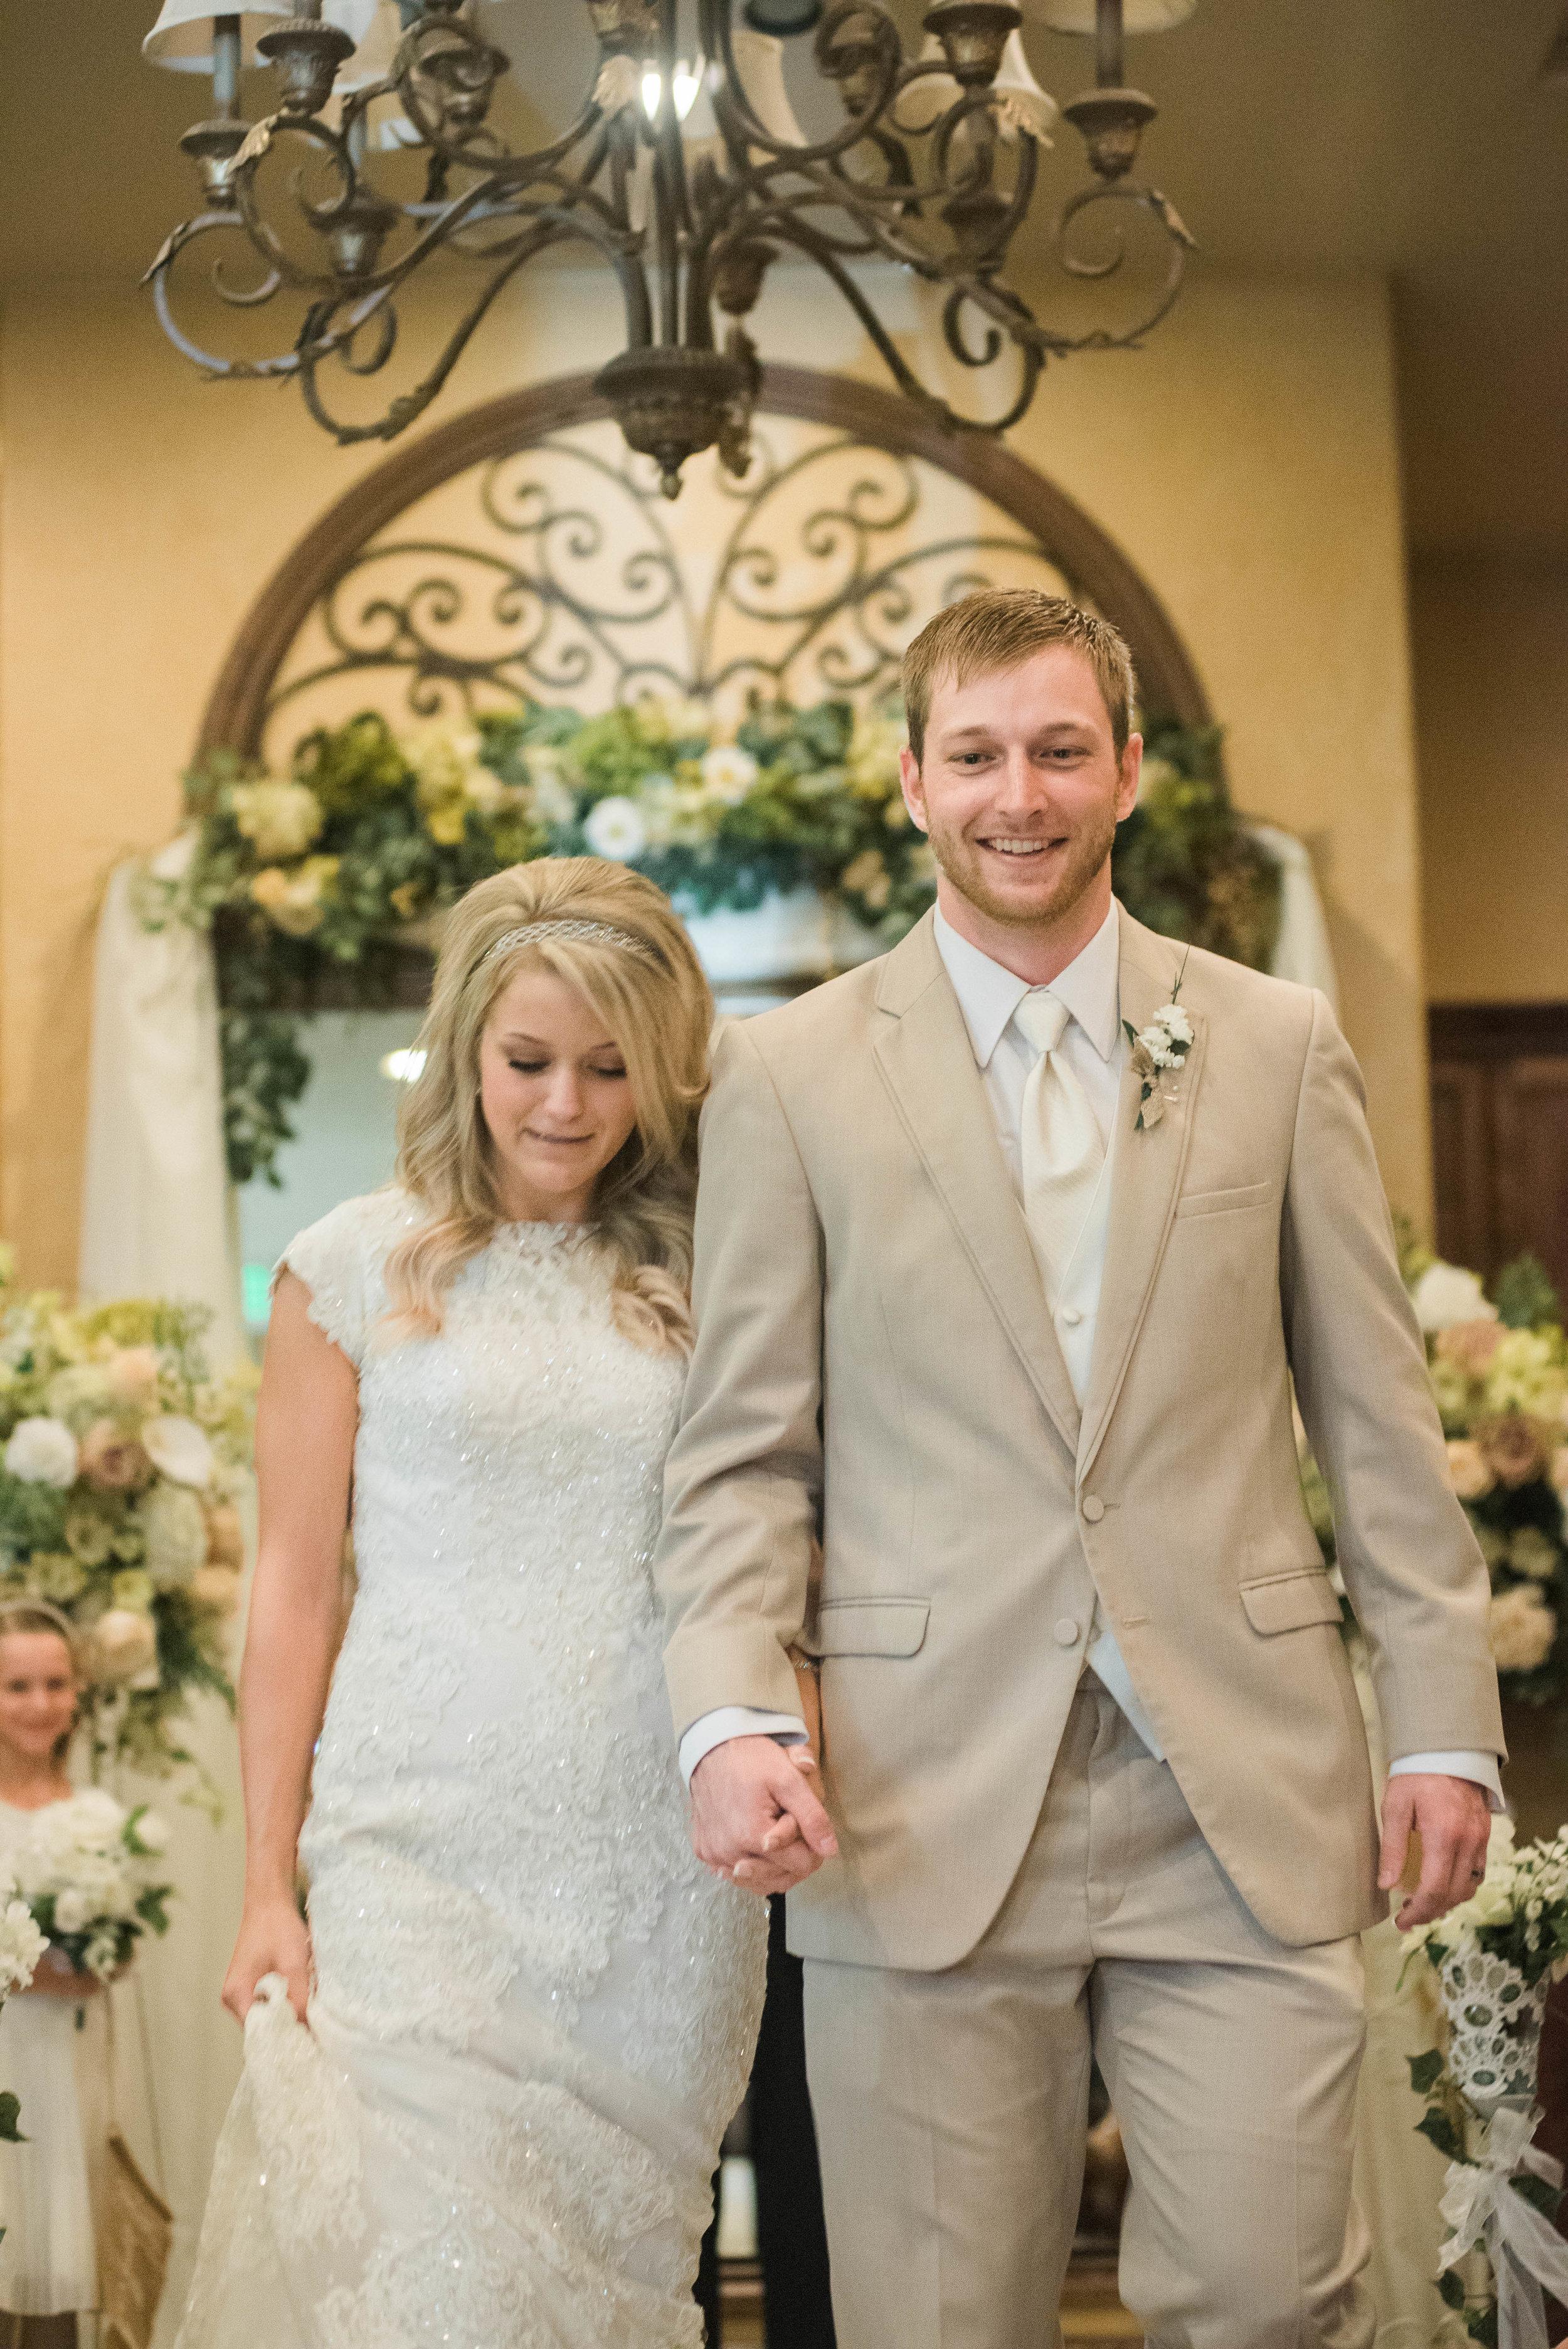 DANIEL+LACI-WEDDING-Sadie_Banks_Photography-240.jpg